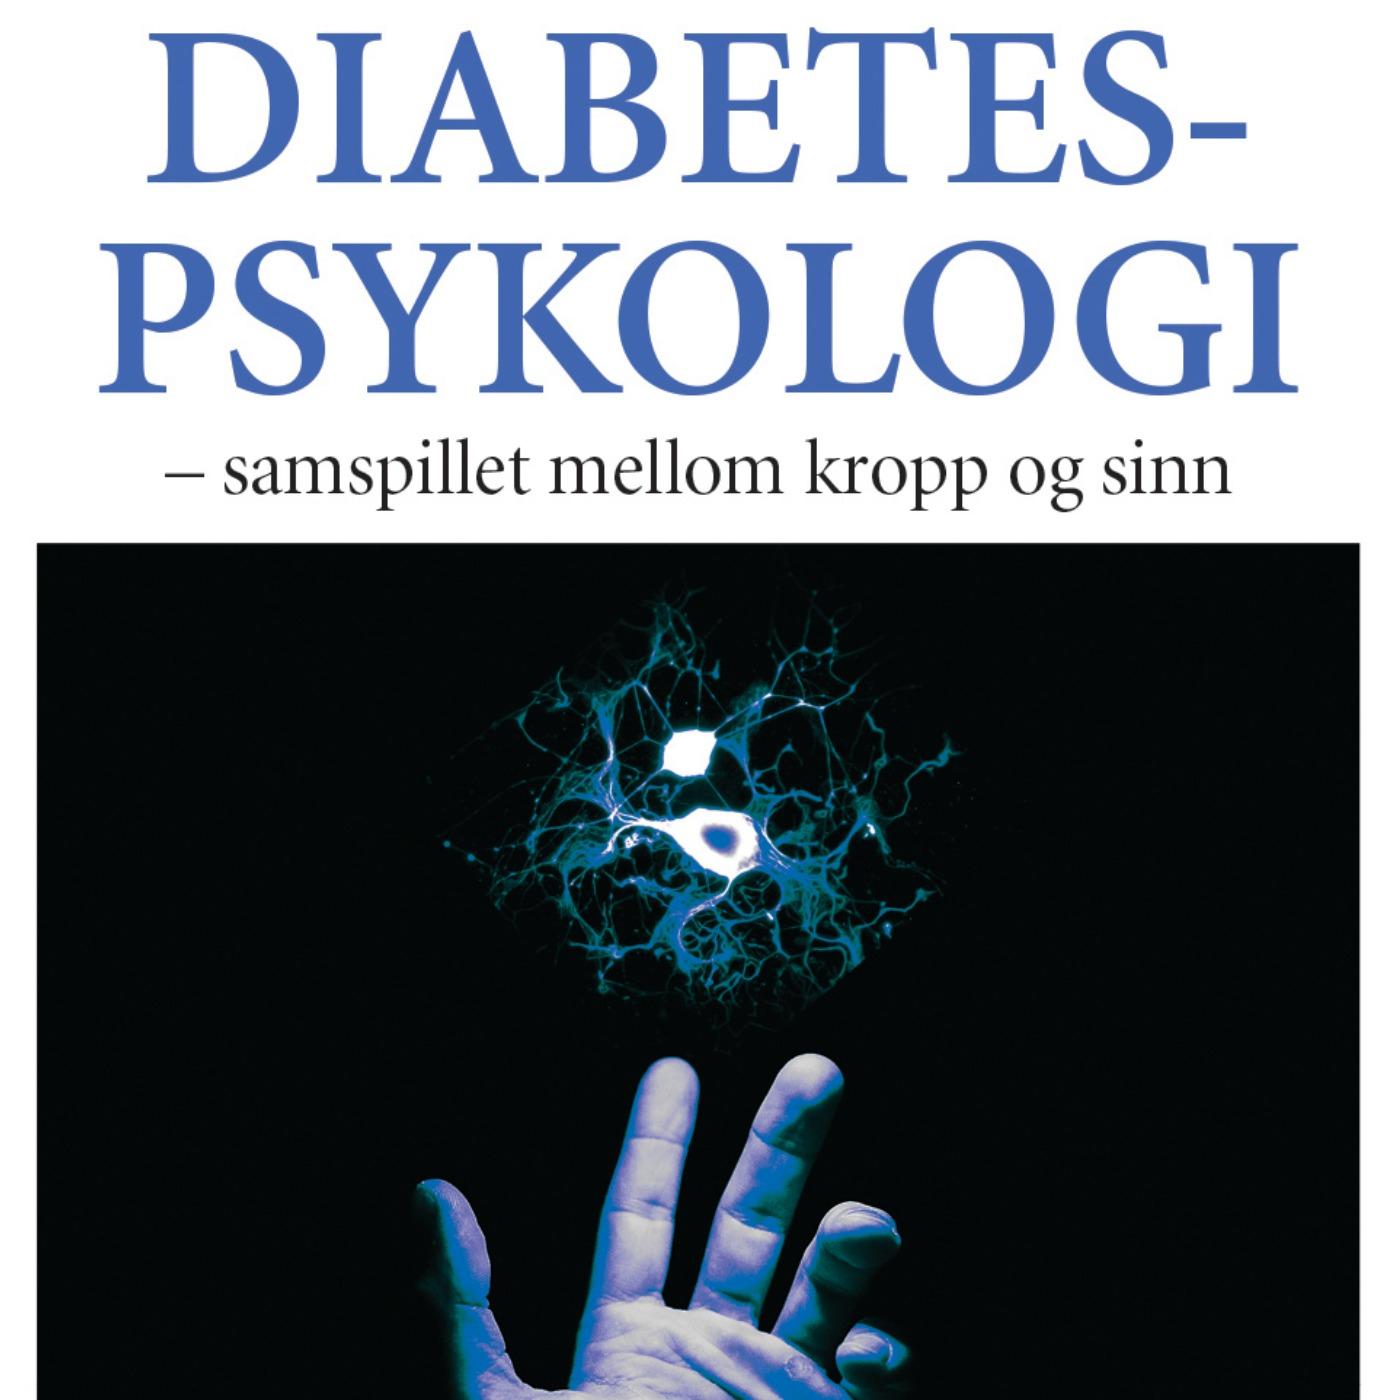 Diabetespsykologi med Jon Haug